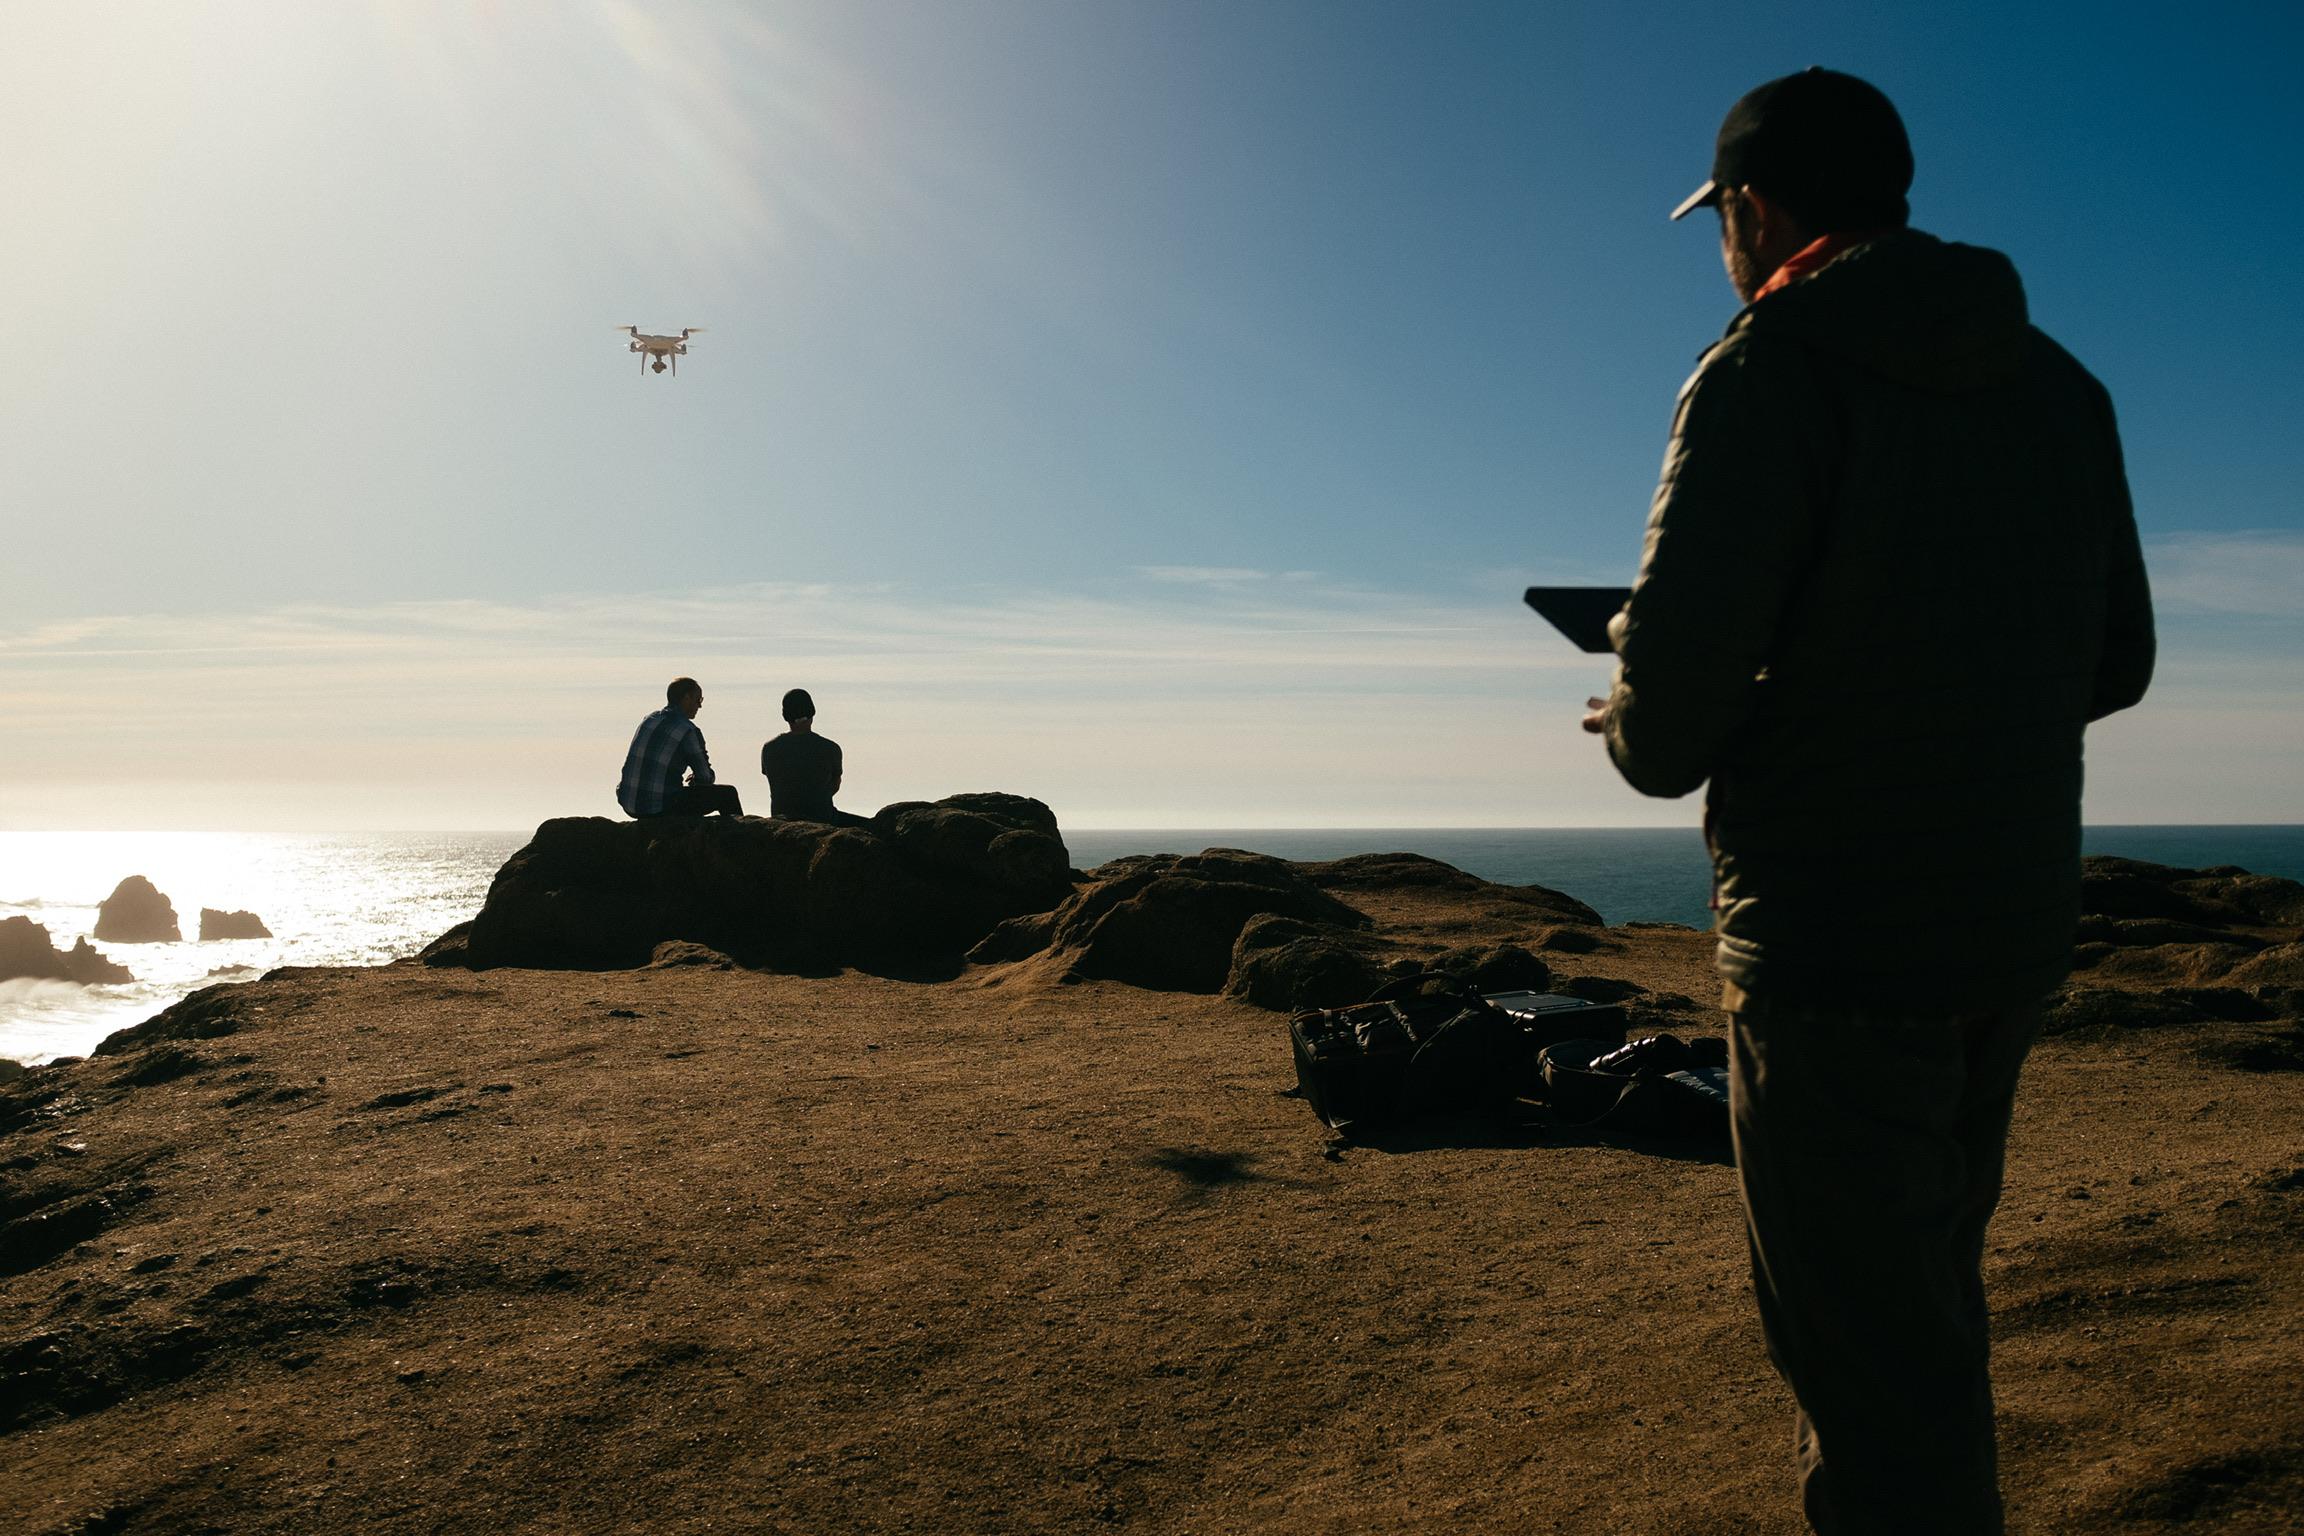 Rachid pilots his beloved drone